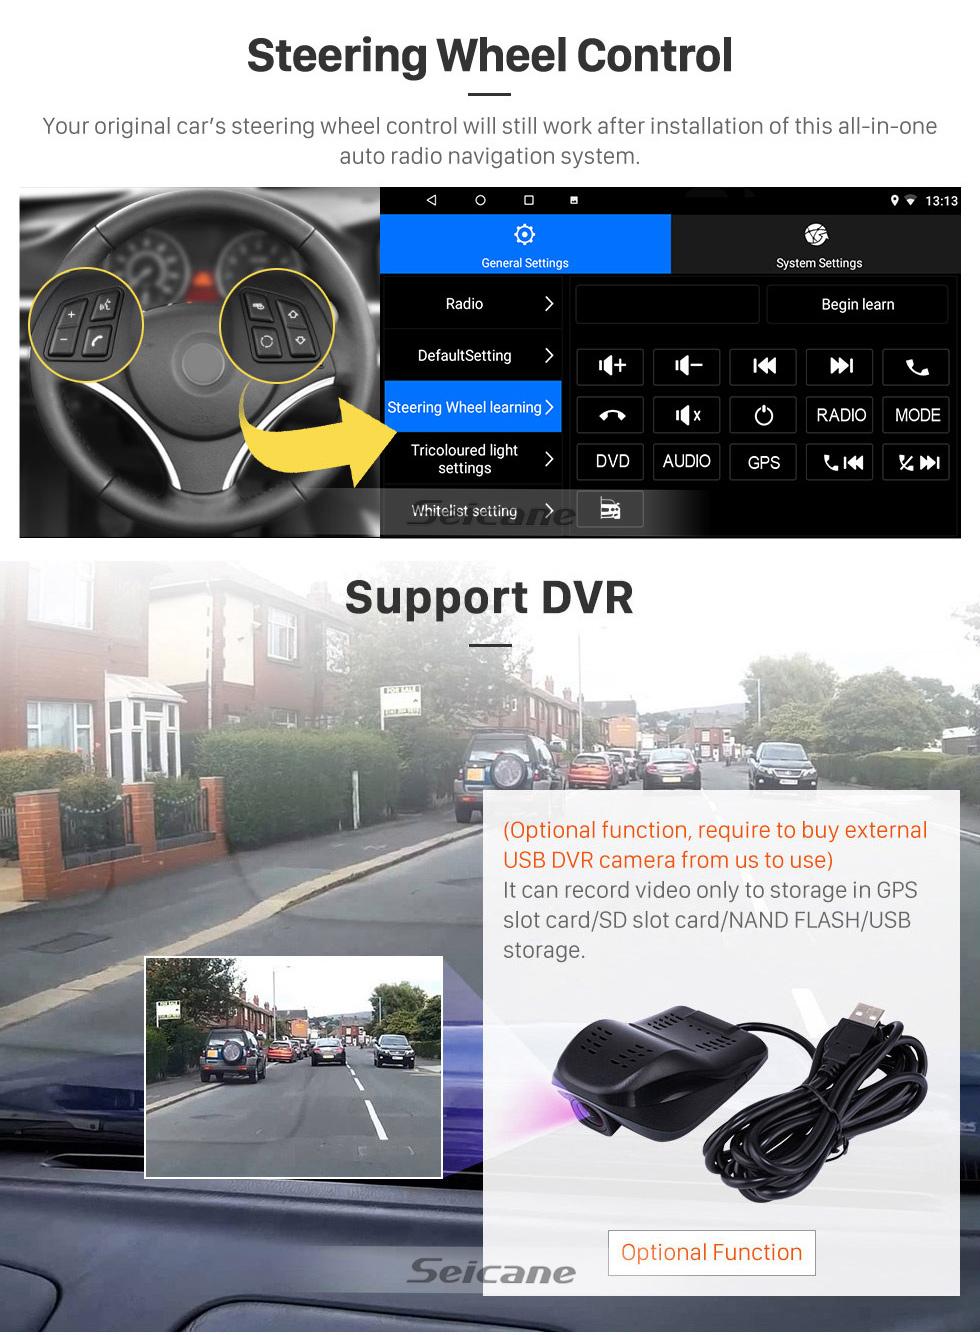 Seicane OEM 9 pouces Android 8.1 pour 2017 Great Wall Haval H2 (étiquette rouge) Radio Bluetooth HD à écran tactile GPS Navigation System Support Carplay DAB +